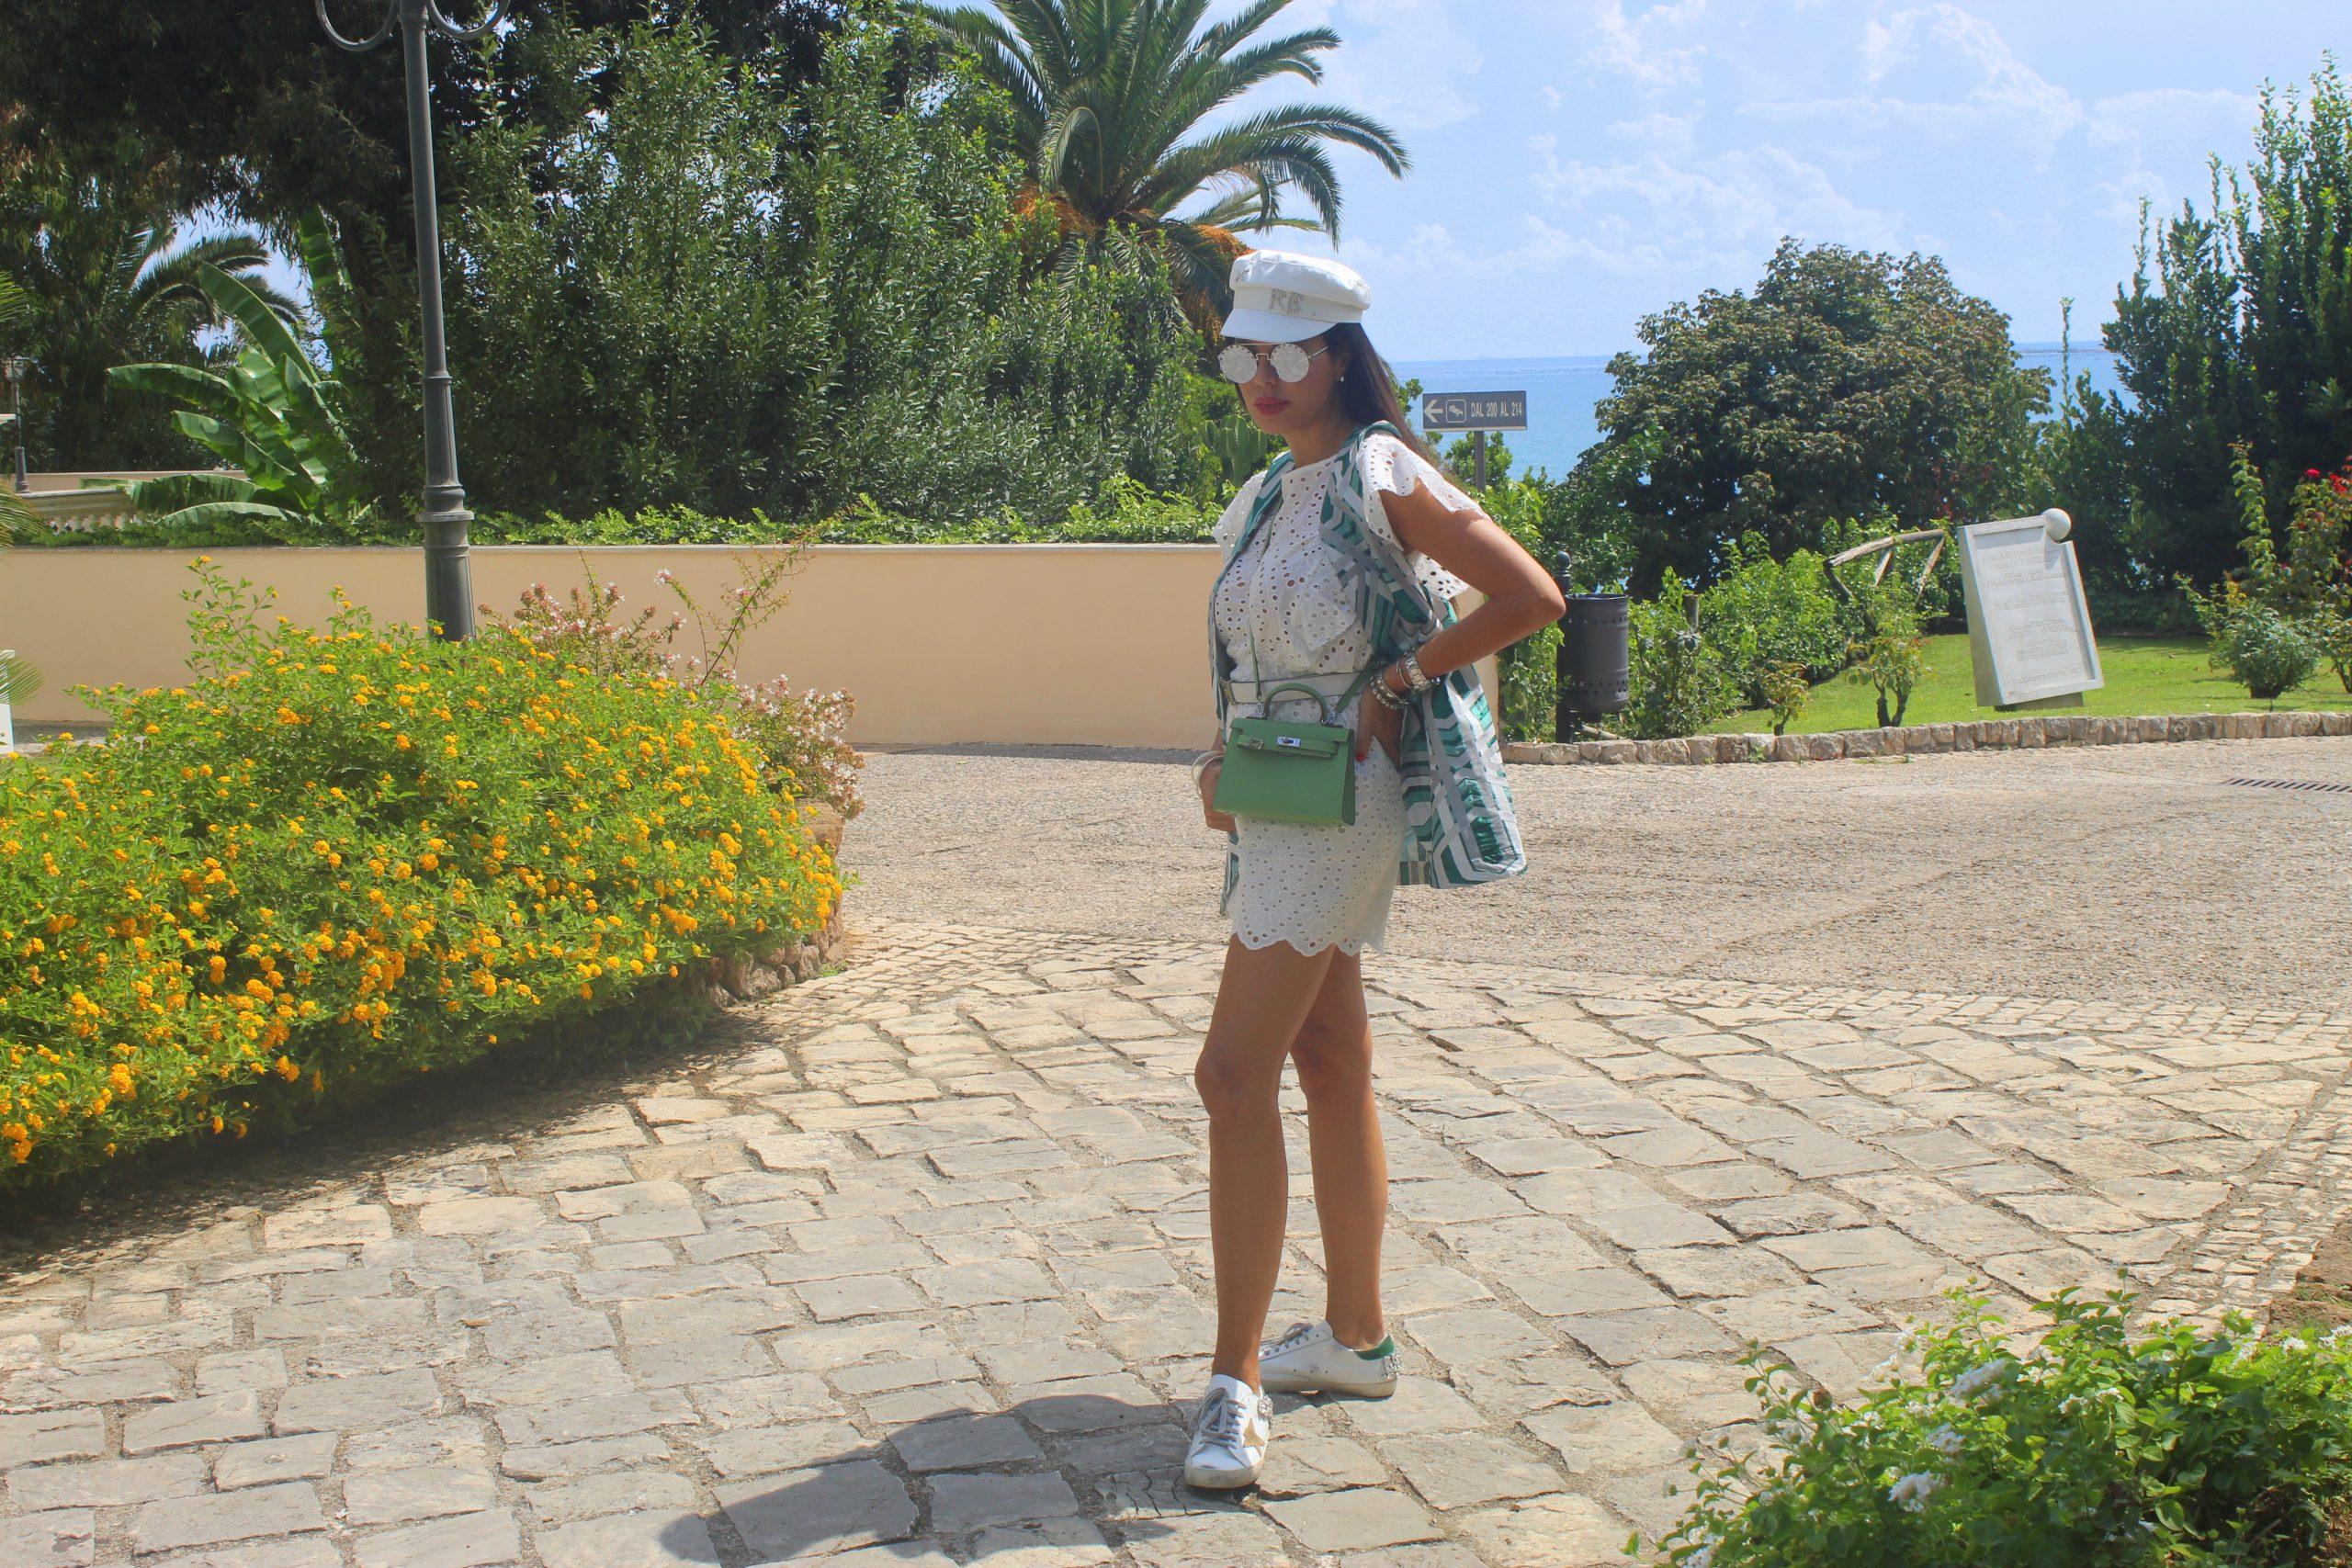 Travel in Italy Visit Gaeta Summer Vacation Cozy Lookbook JIJIL gilet e tuta  RUSLAN Paola Lauretano BAGINSKIY cappello  HERMES borsa  GOLDEN GOOSE sneakers